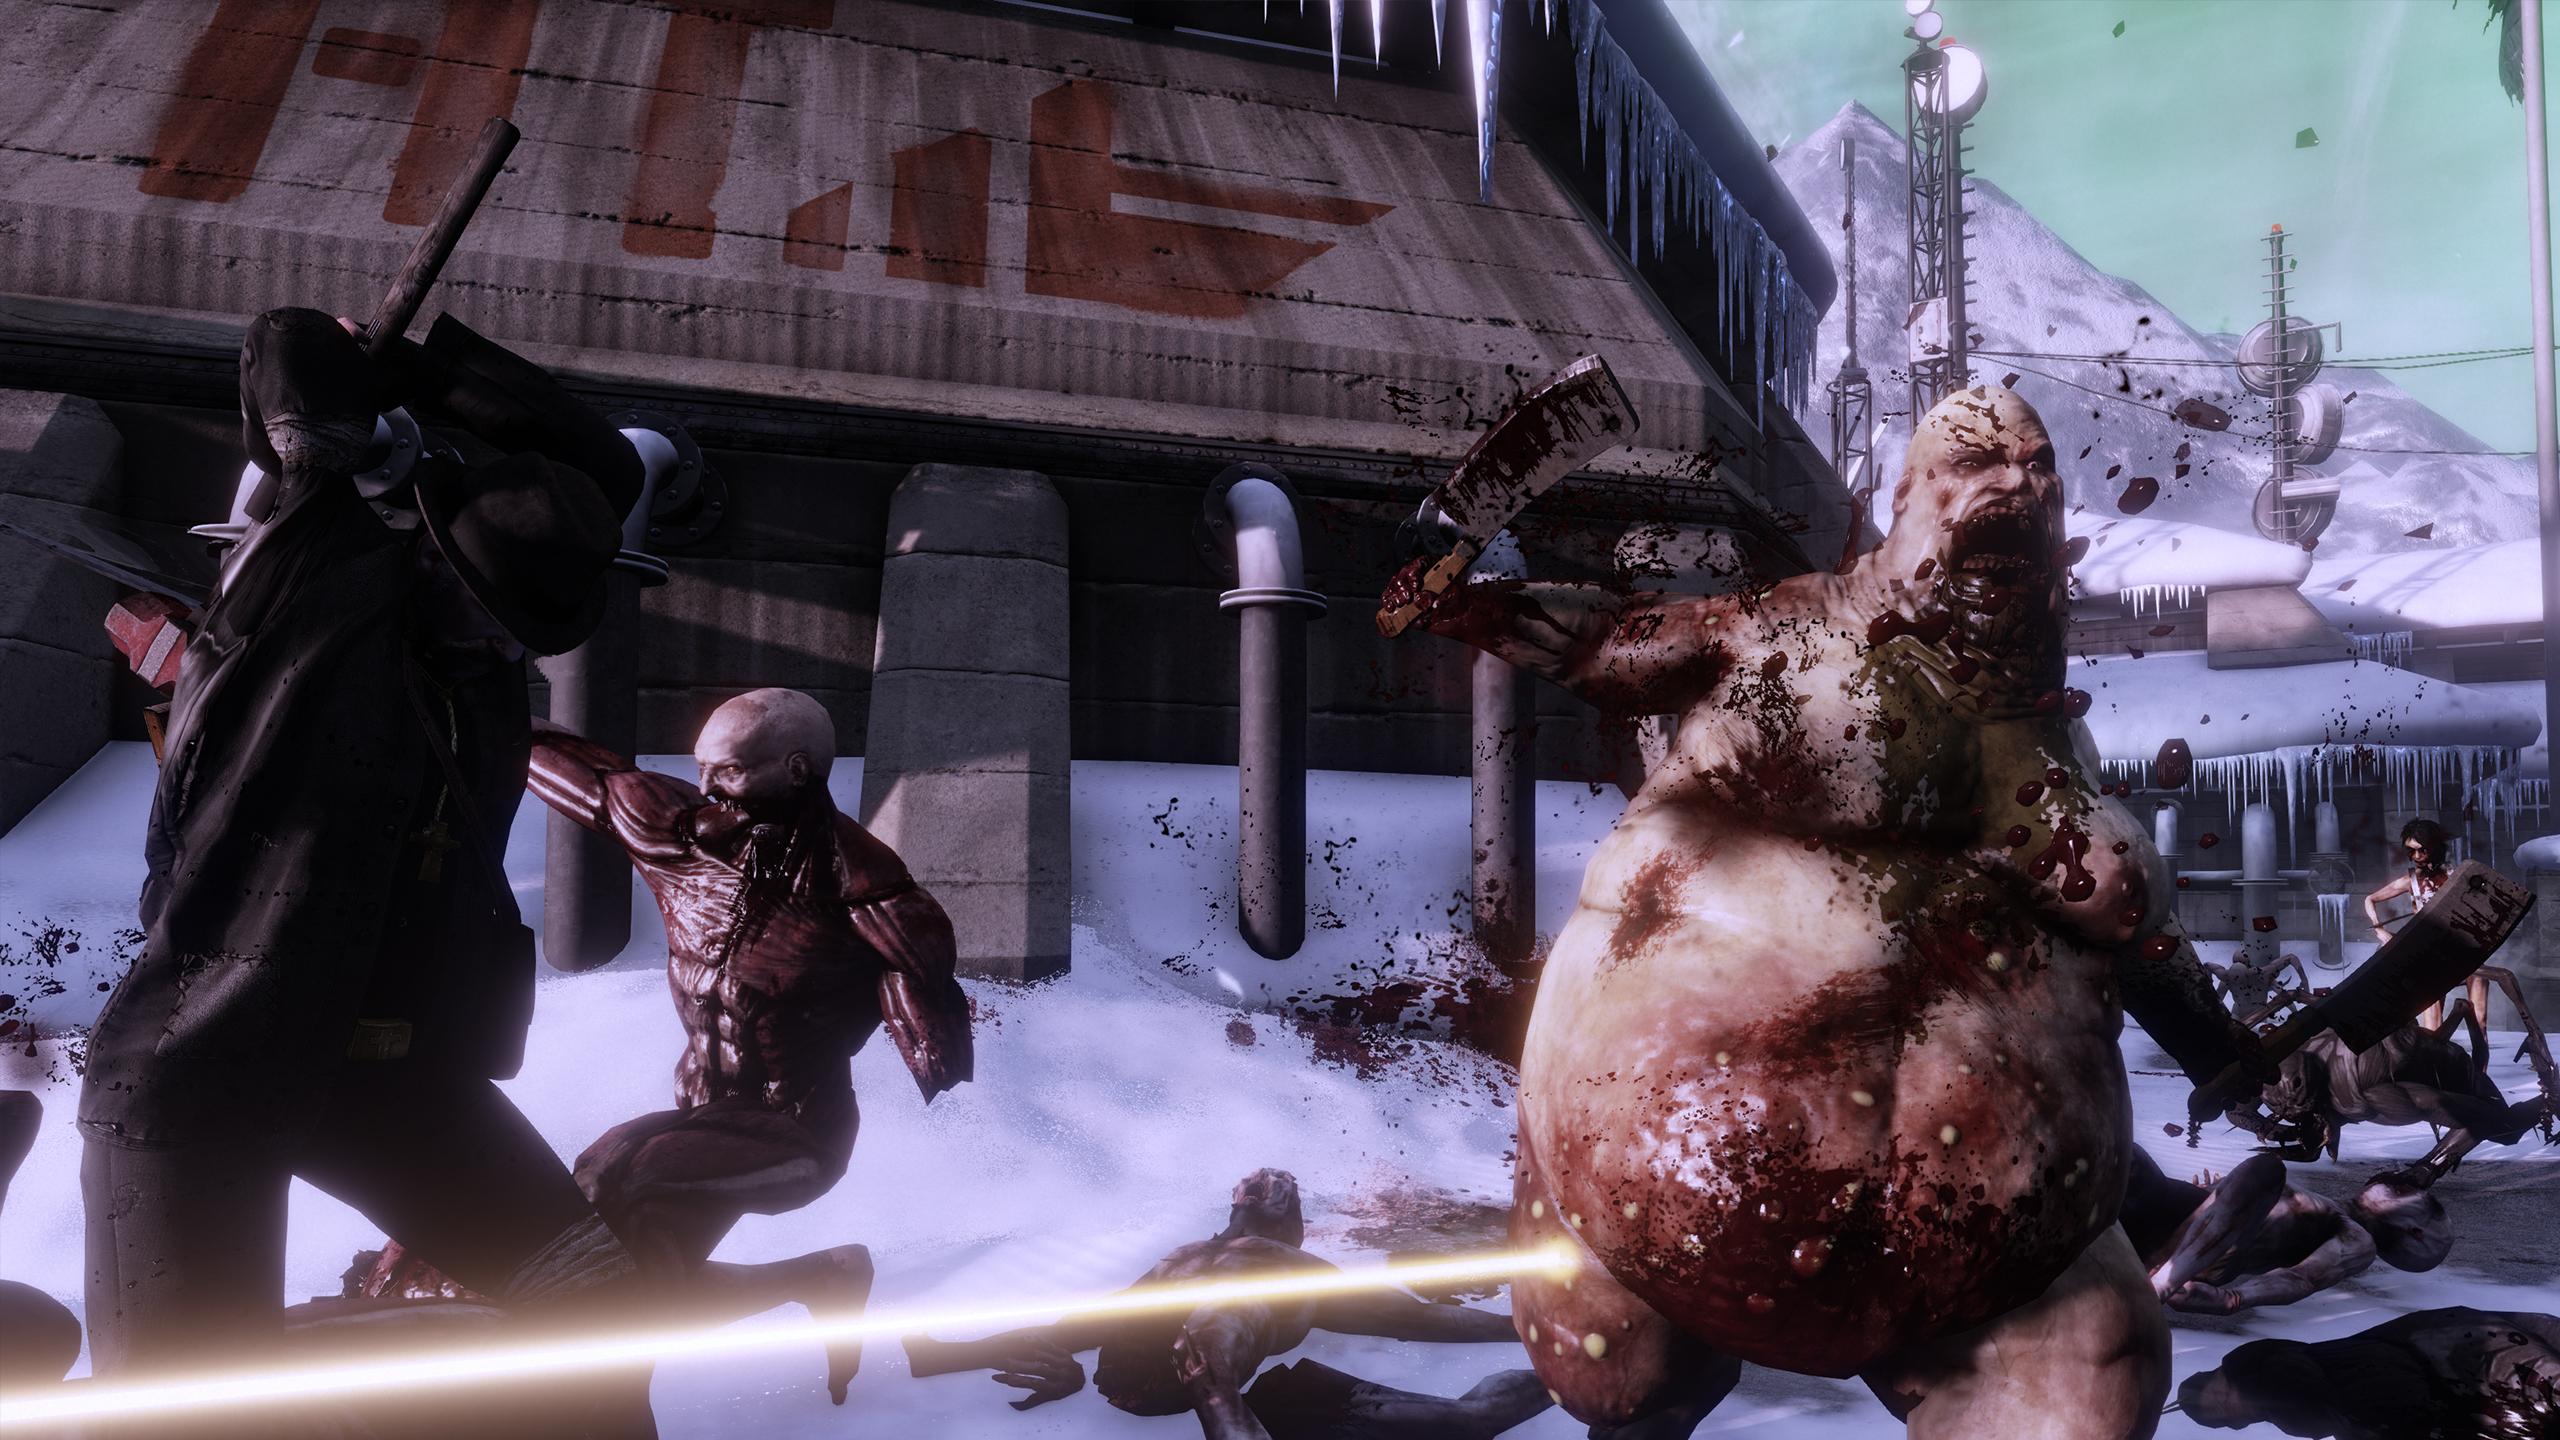 Čerstvá várka krvavých screenshotů z Killing Floor 2 105159